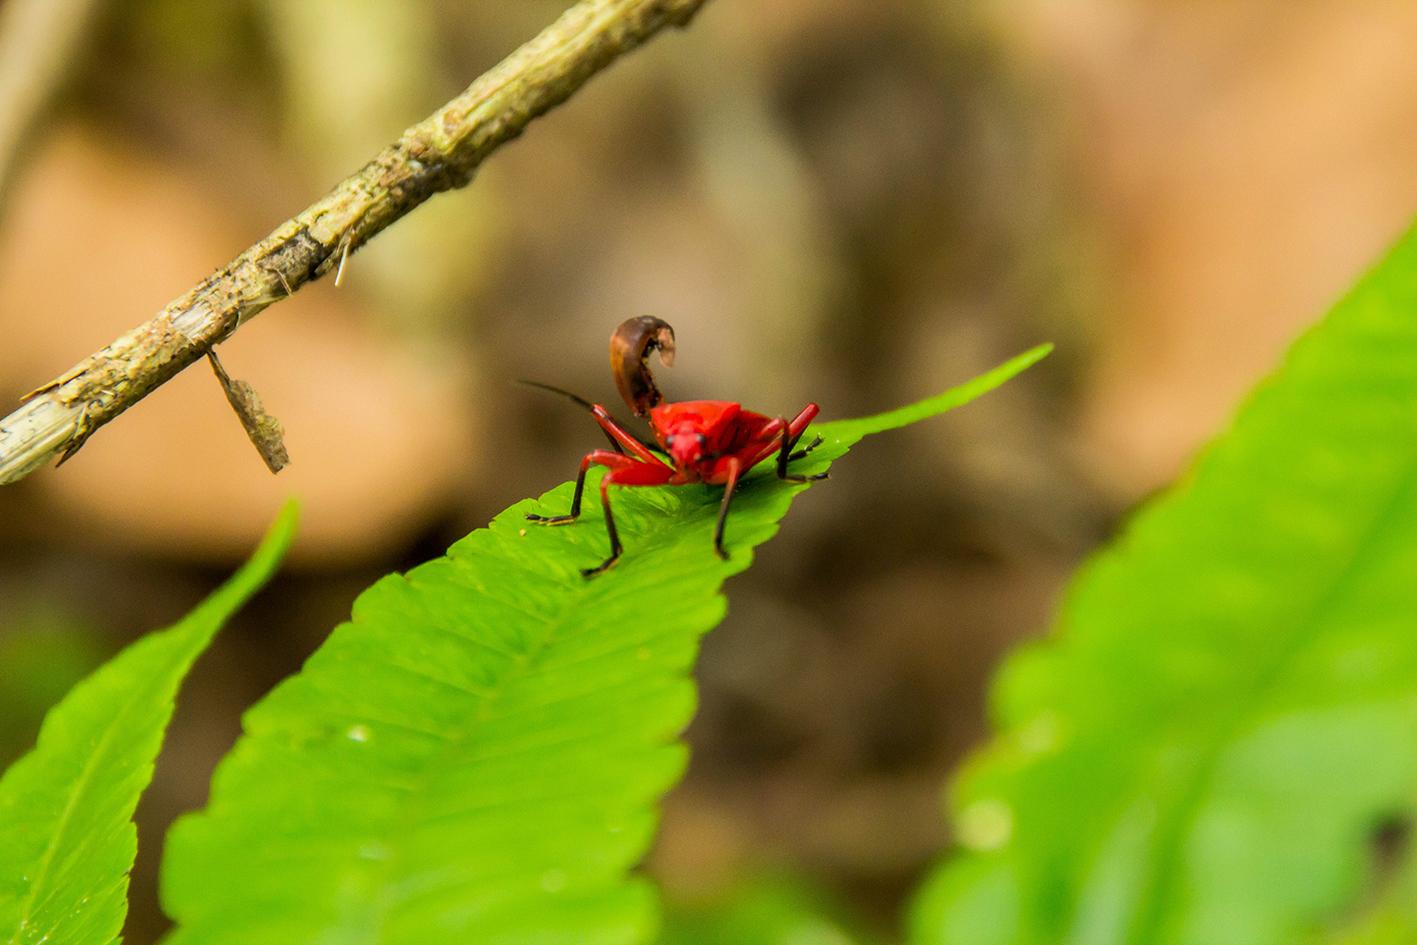 Röd bomullsbagge (Dysdercus cingulatus). Foto: Patrik Enlund